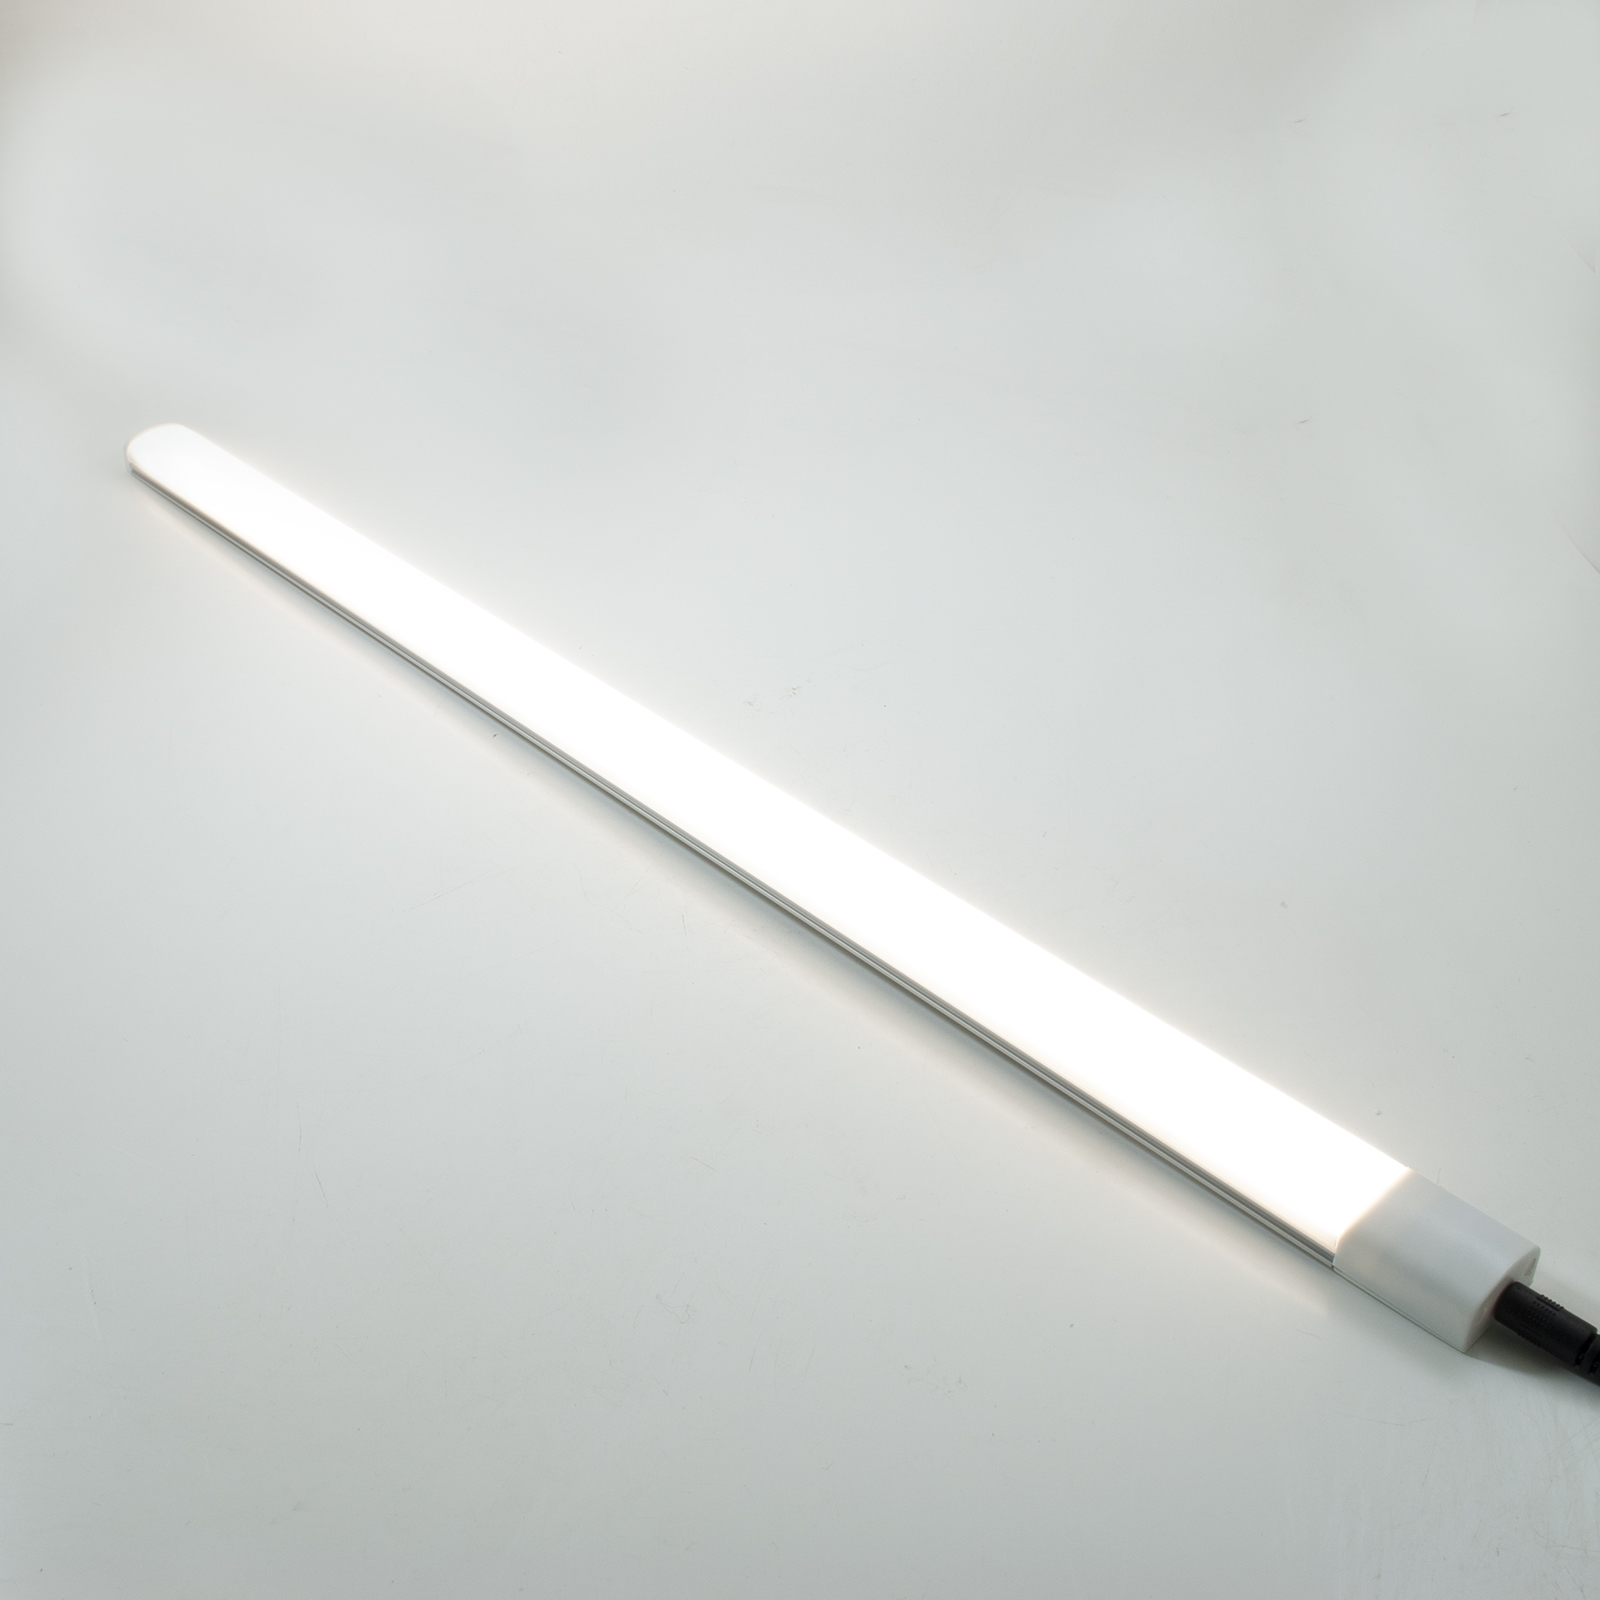 Luci Led Sottopensile Cucina | Led Sottopensile Cucina Ikea 0gdr 5 ...